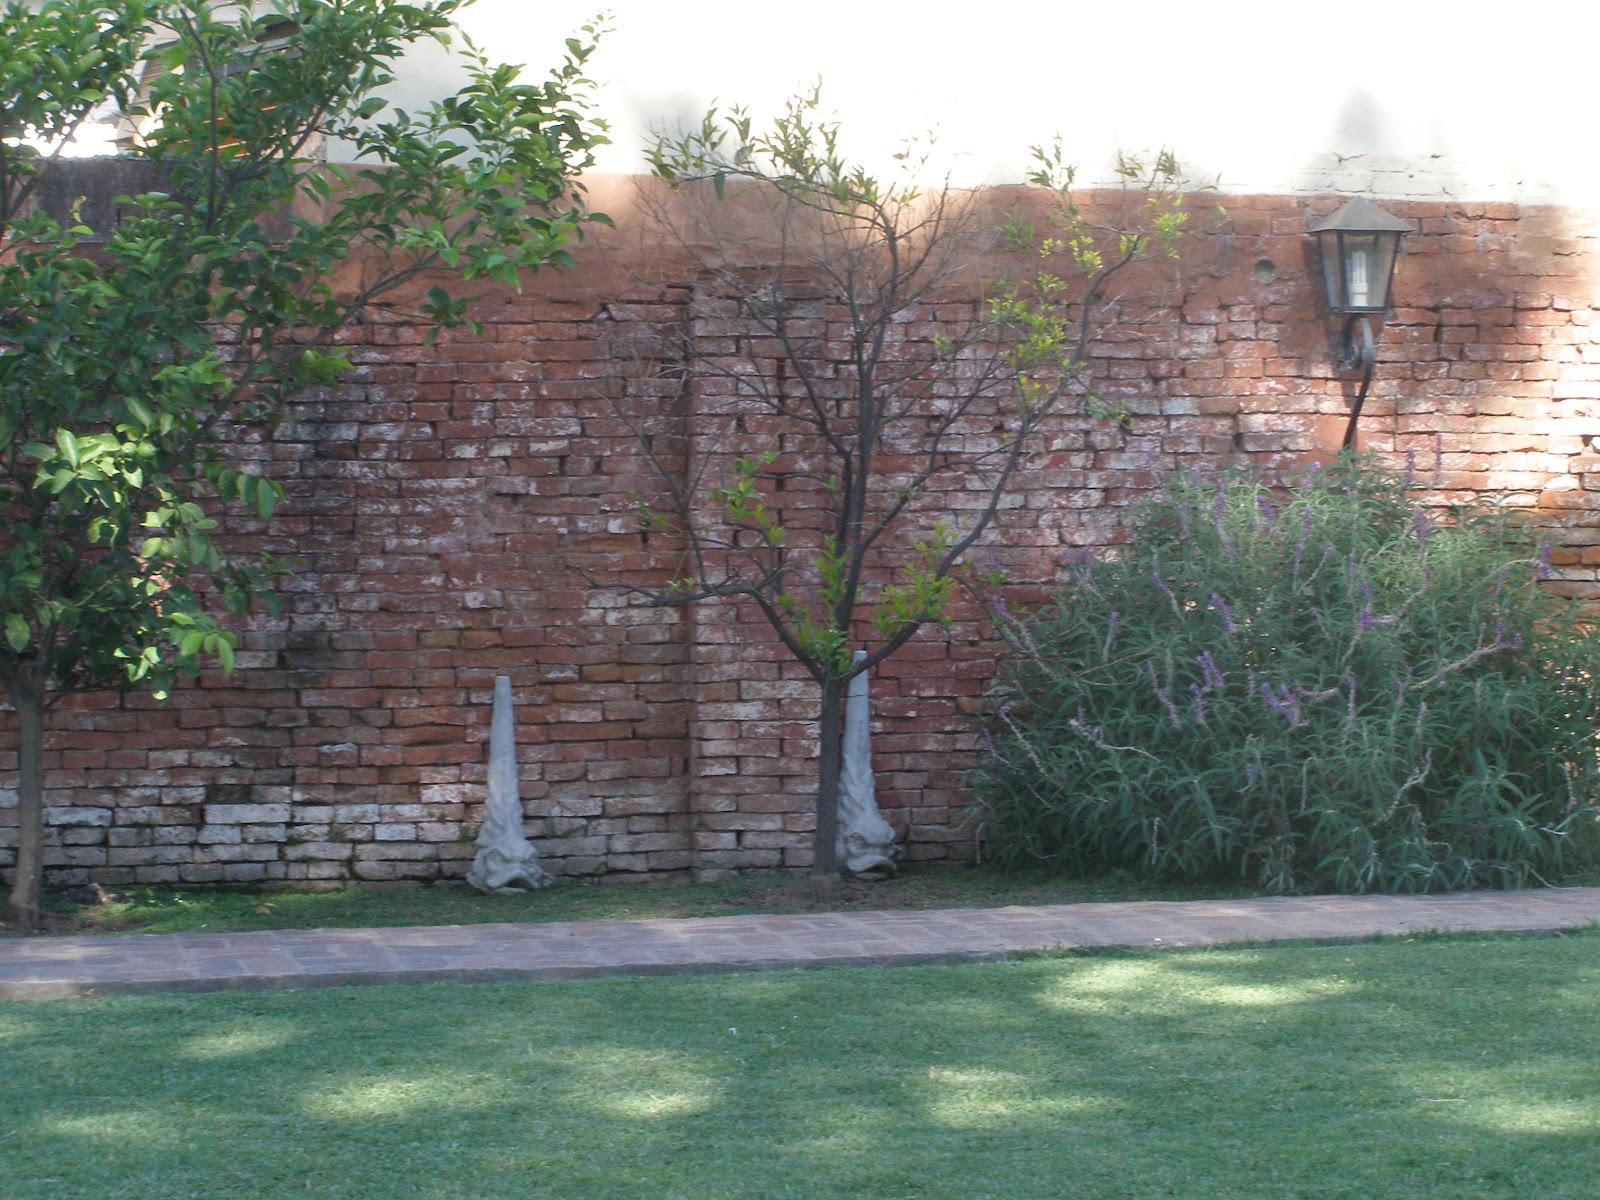 Muros baratos e bonitos coisas pra ver - Tipos de muros ...